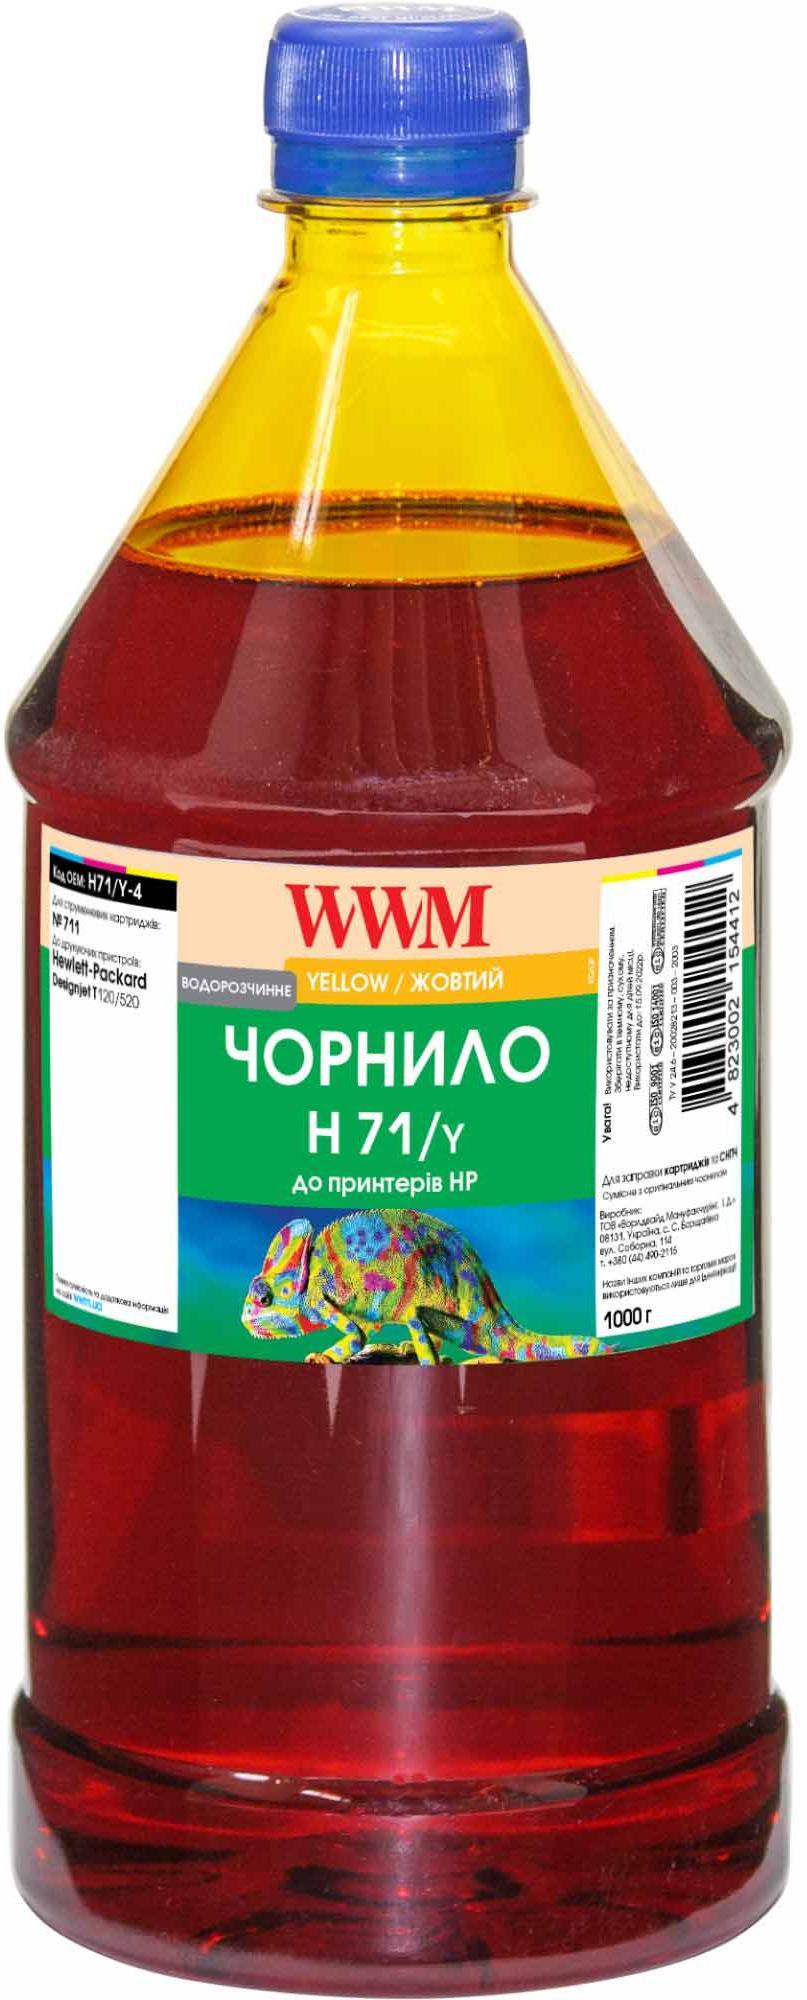 Купить Чорнило WWM for HP №711 1000г Yellow (H71/Y-4)